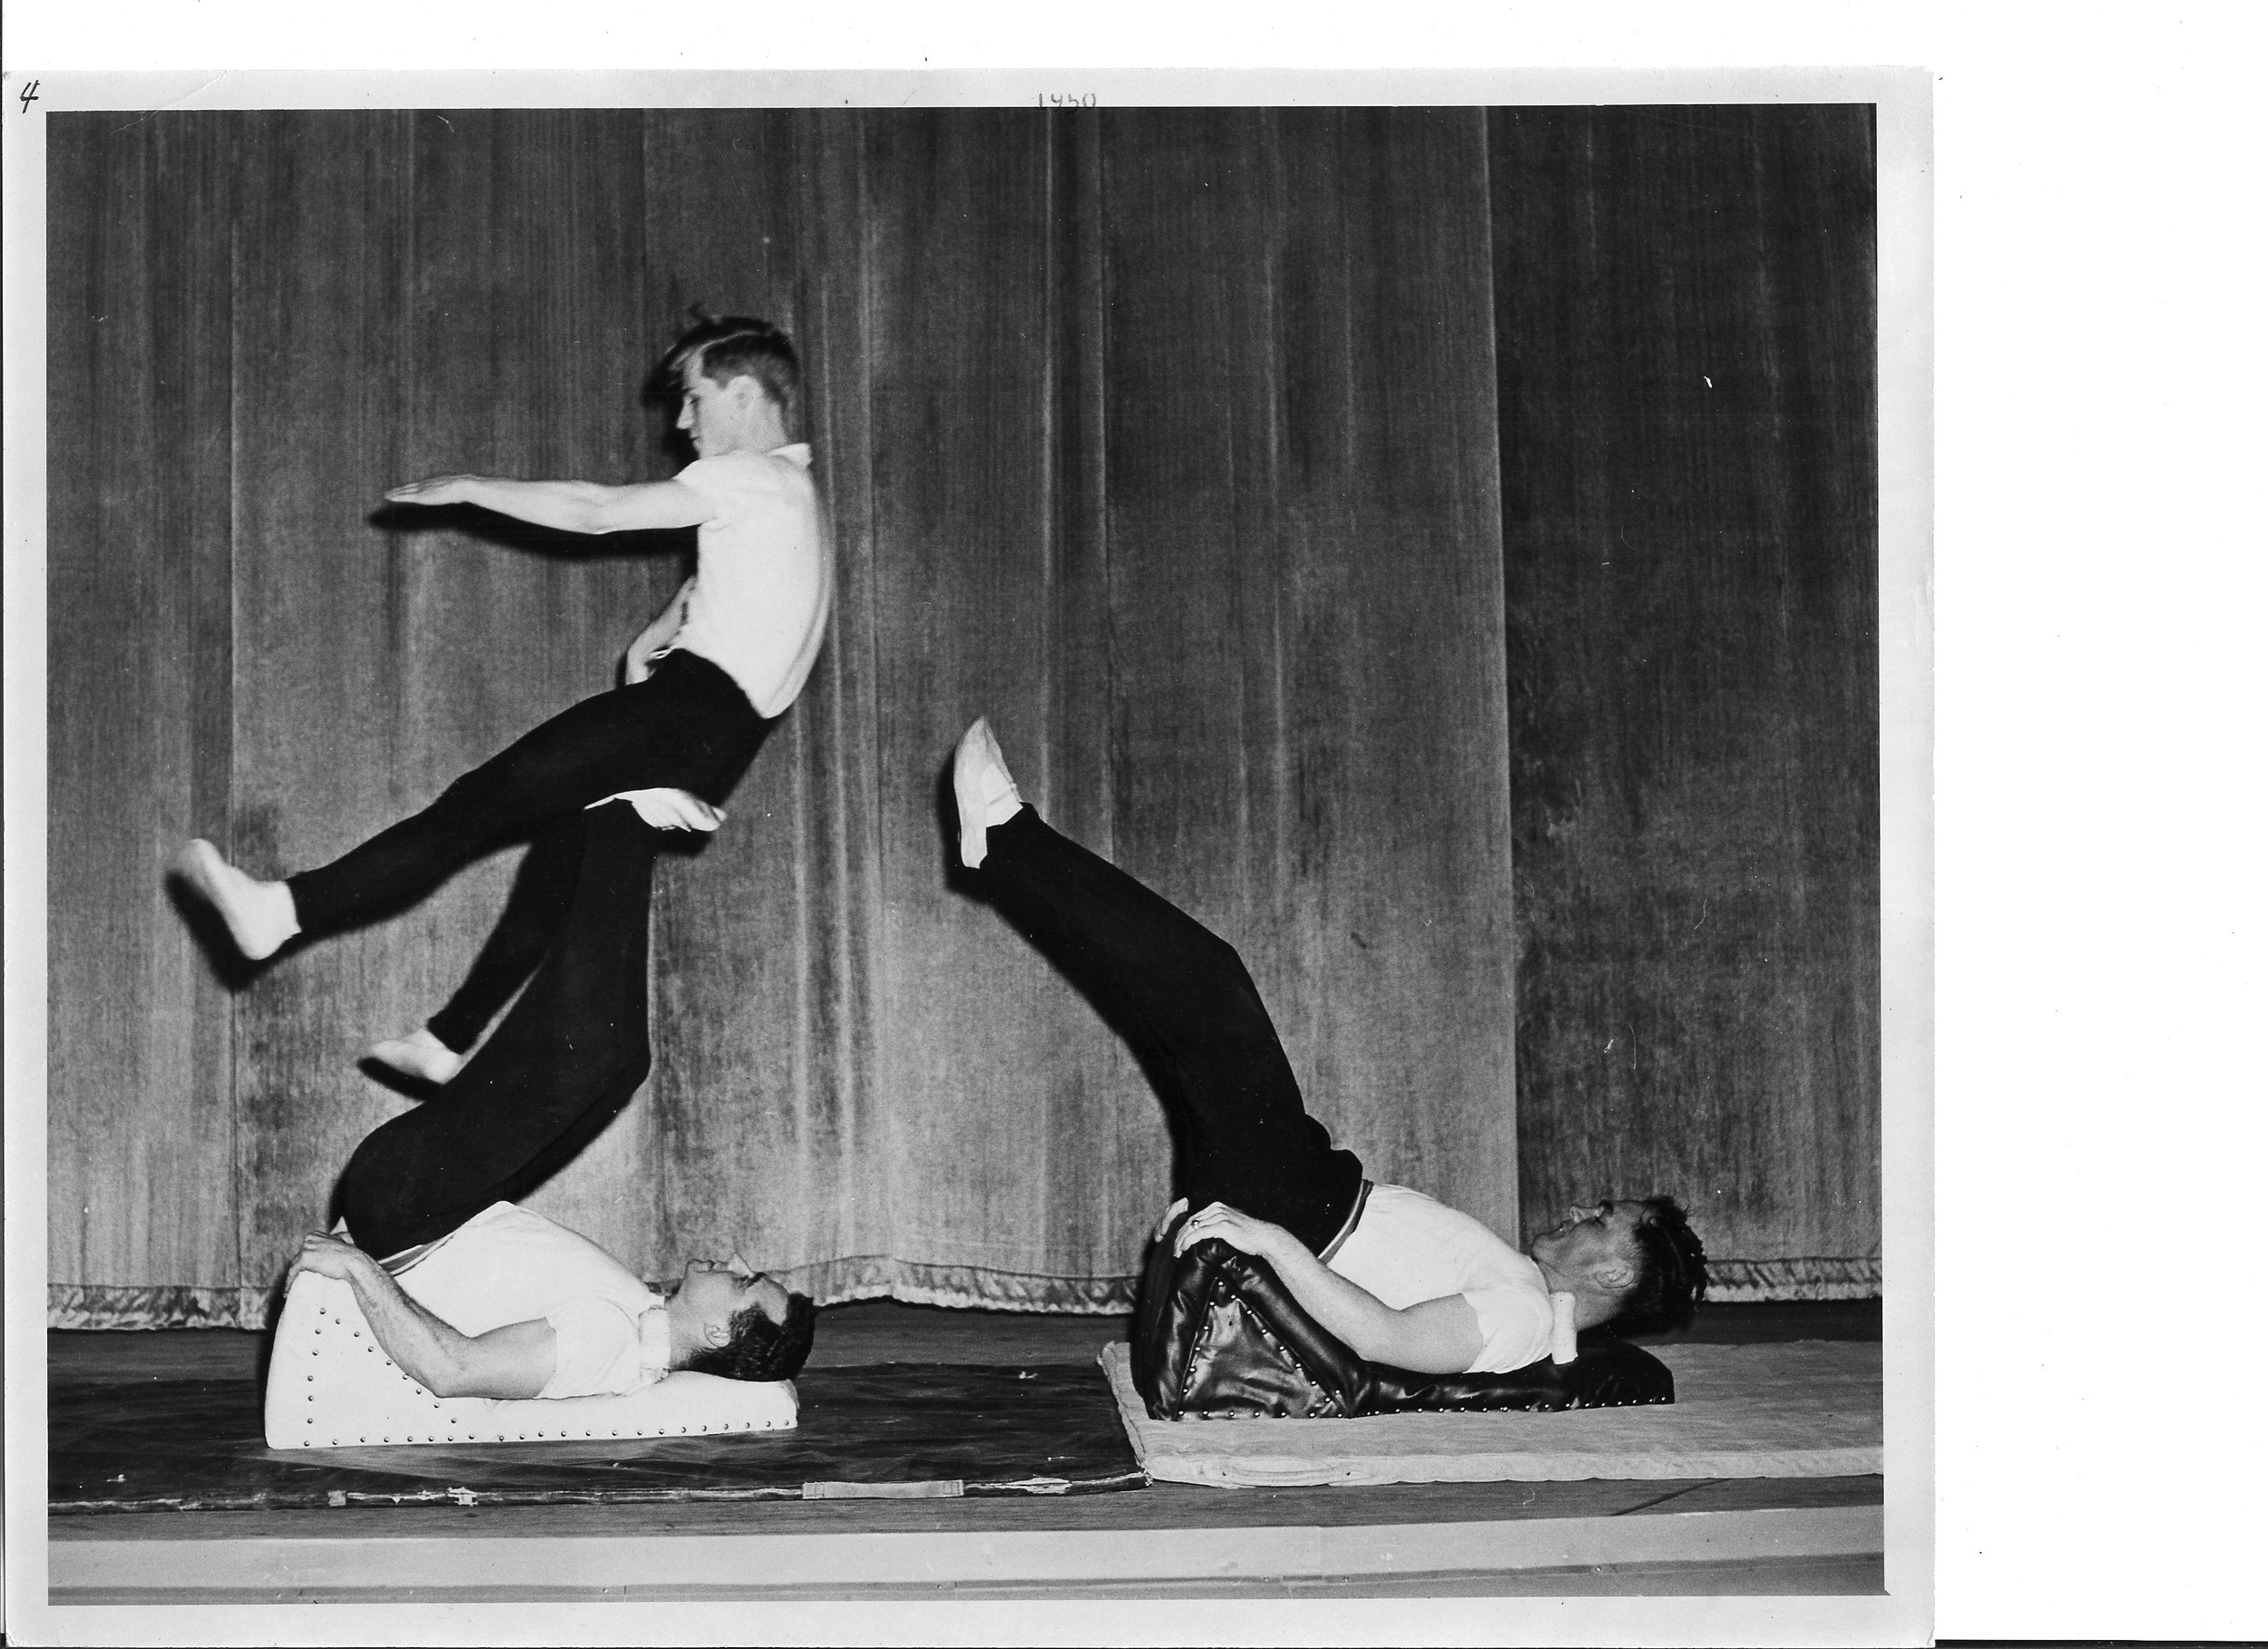 1950 Risley Tumbling - Bob Hooper catching Earl Newland who was thrown from Ollie Fejfar's feet.jpg